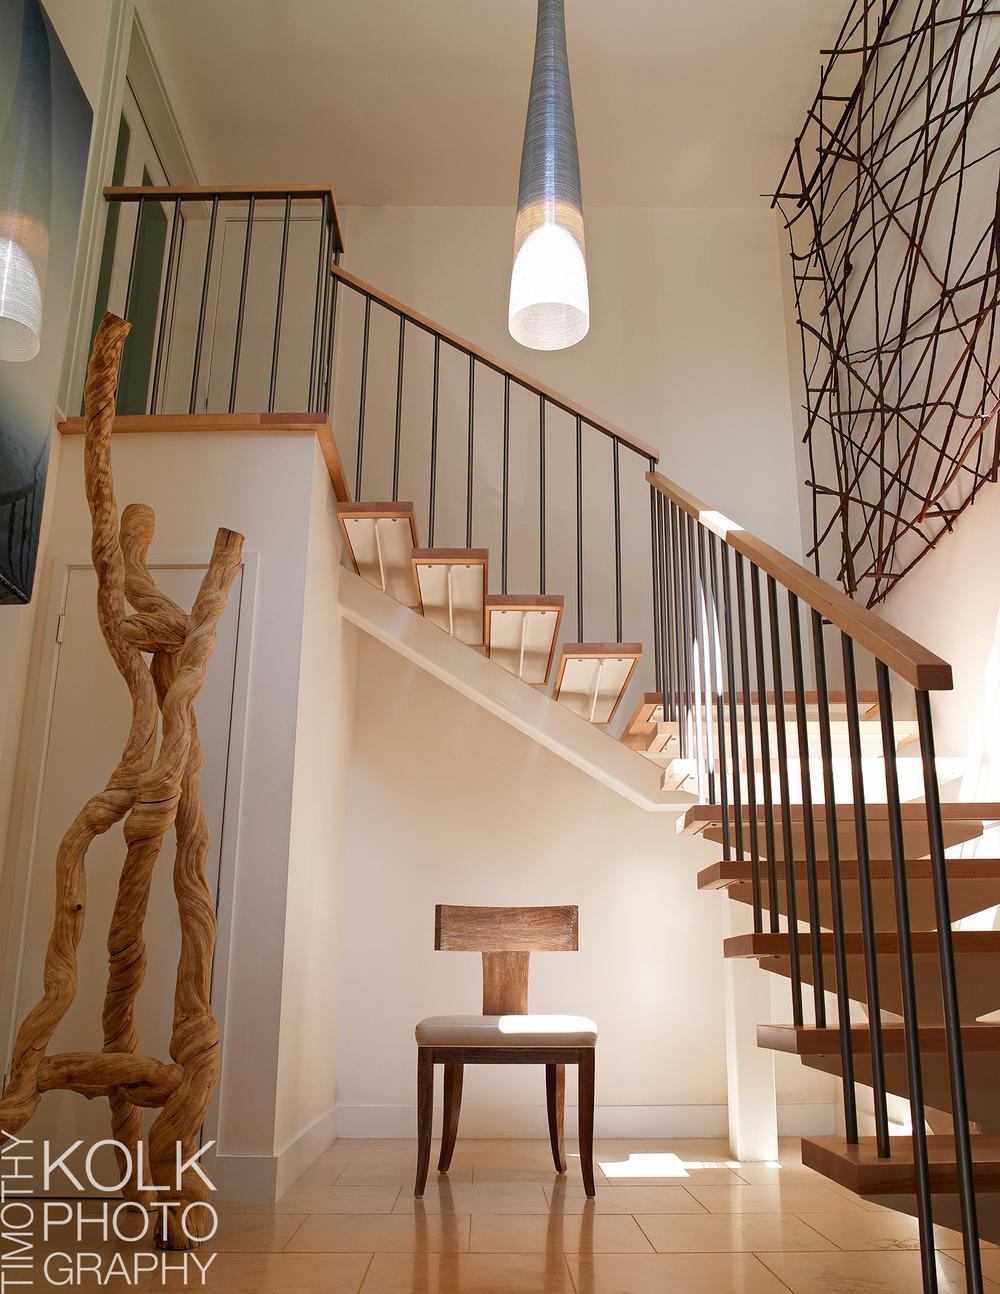 Hardage_staircase_ppw.jpg